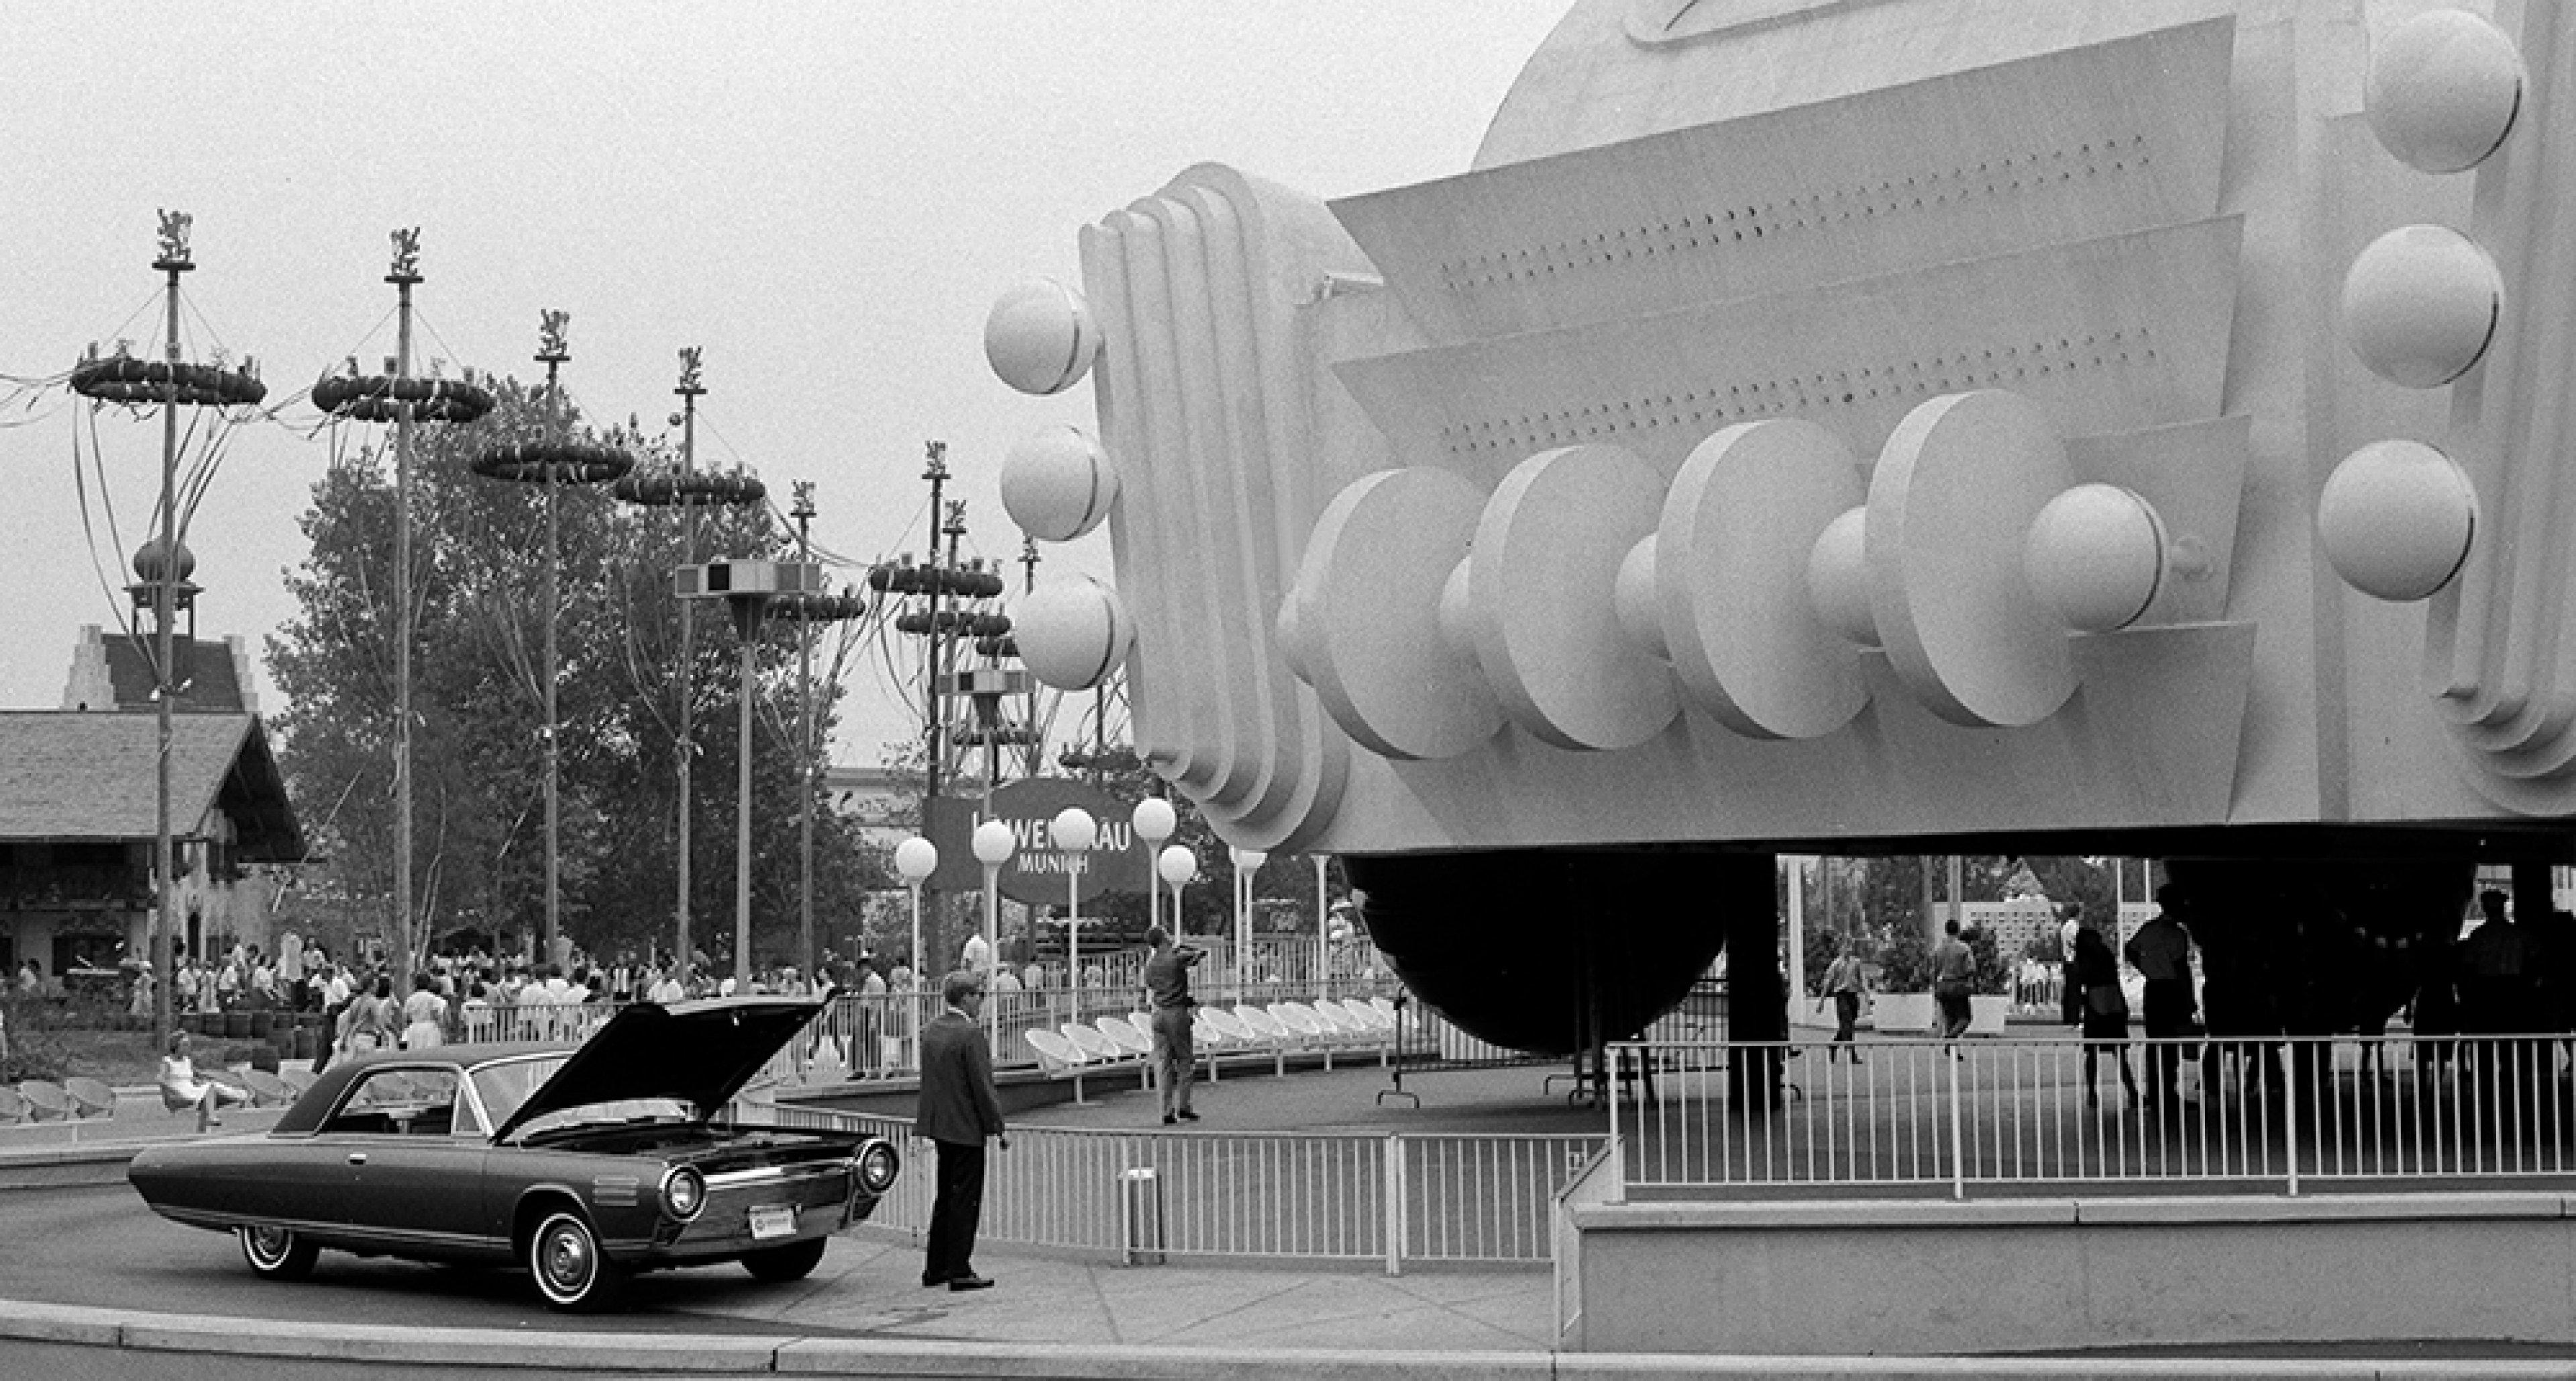 Chrysler Turbine at the 1964 New York World's Fair.